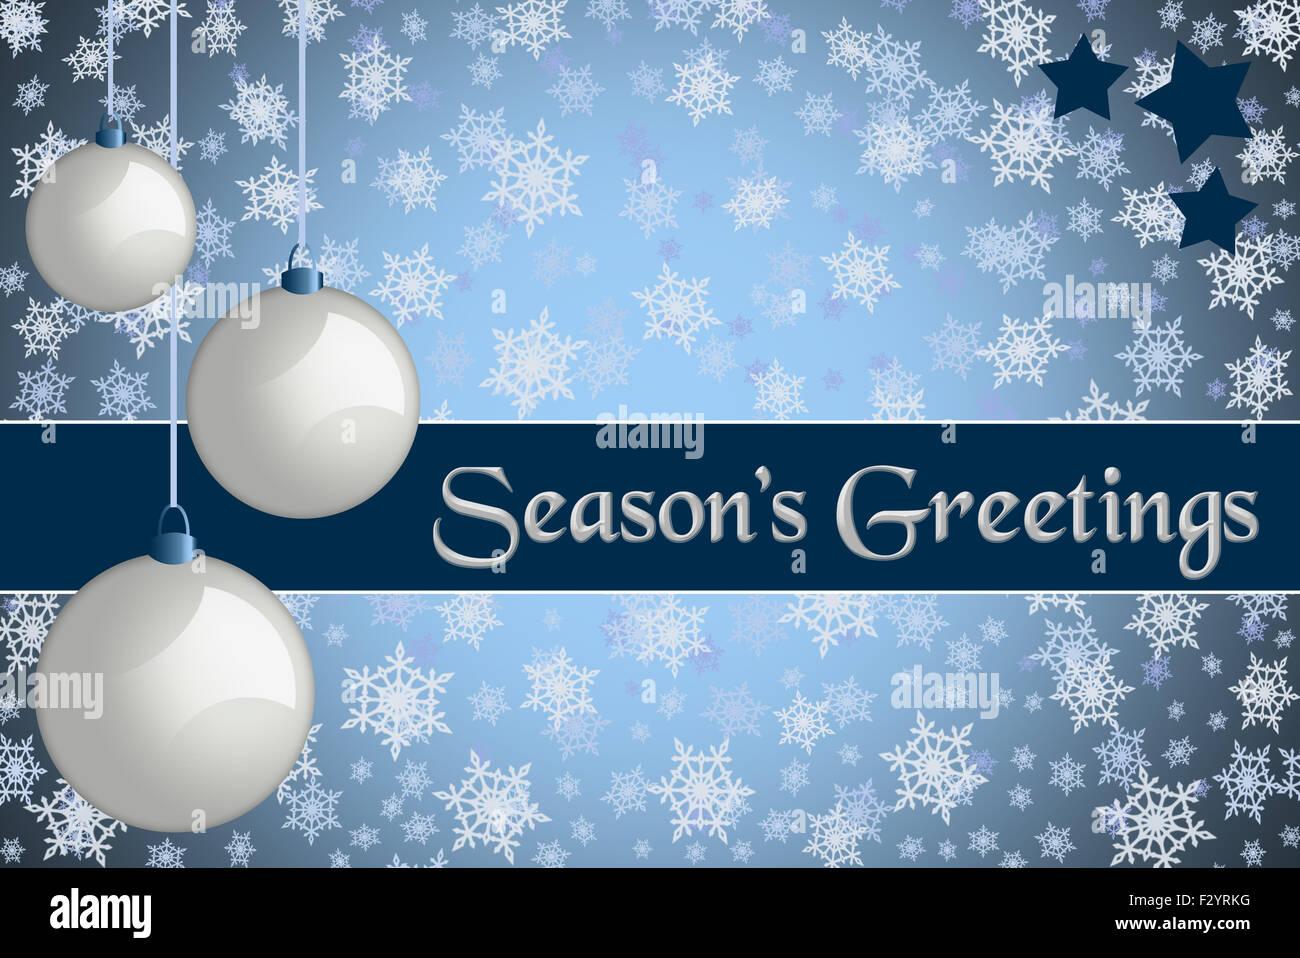 Christmas greeting card seasons greetings blue colored christmas greeting card seasons greetings blue colored christmas card with retro white baubles and snowflake background kristyandbryce Choice Image